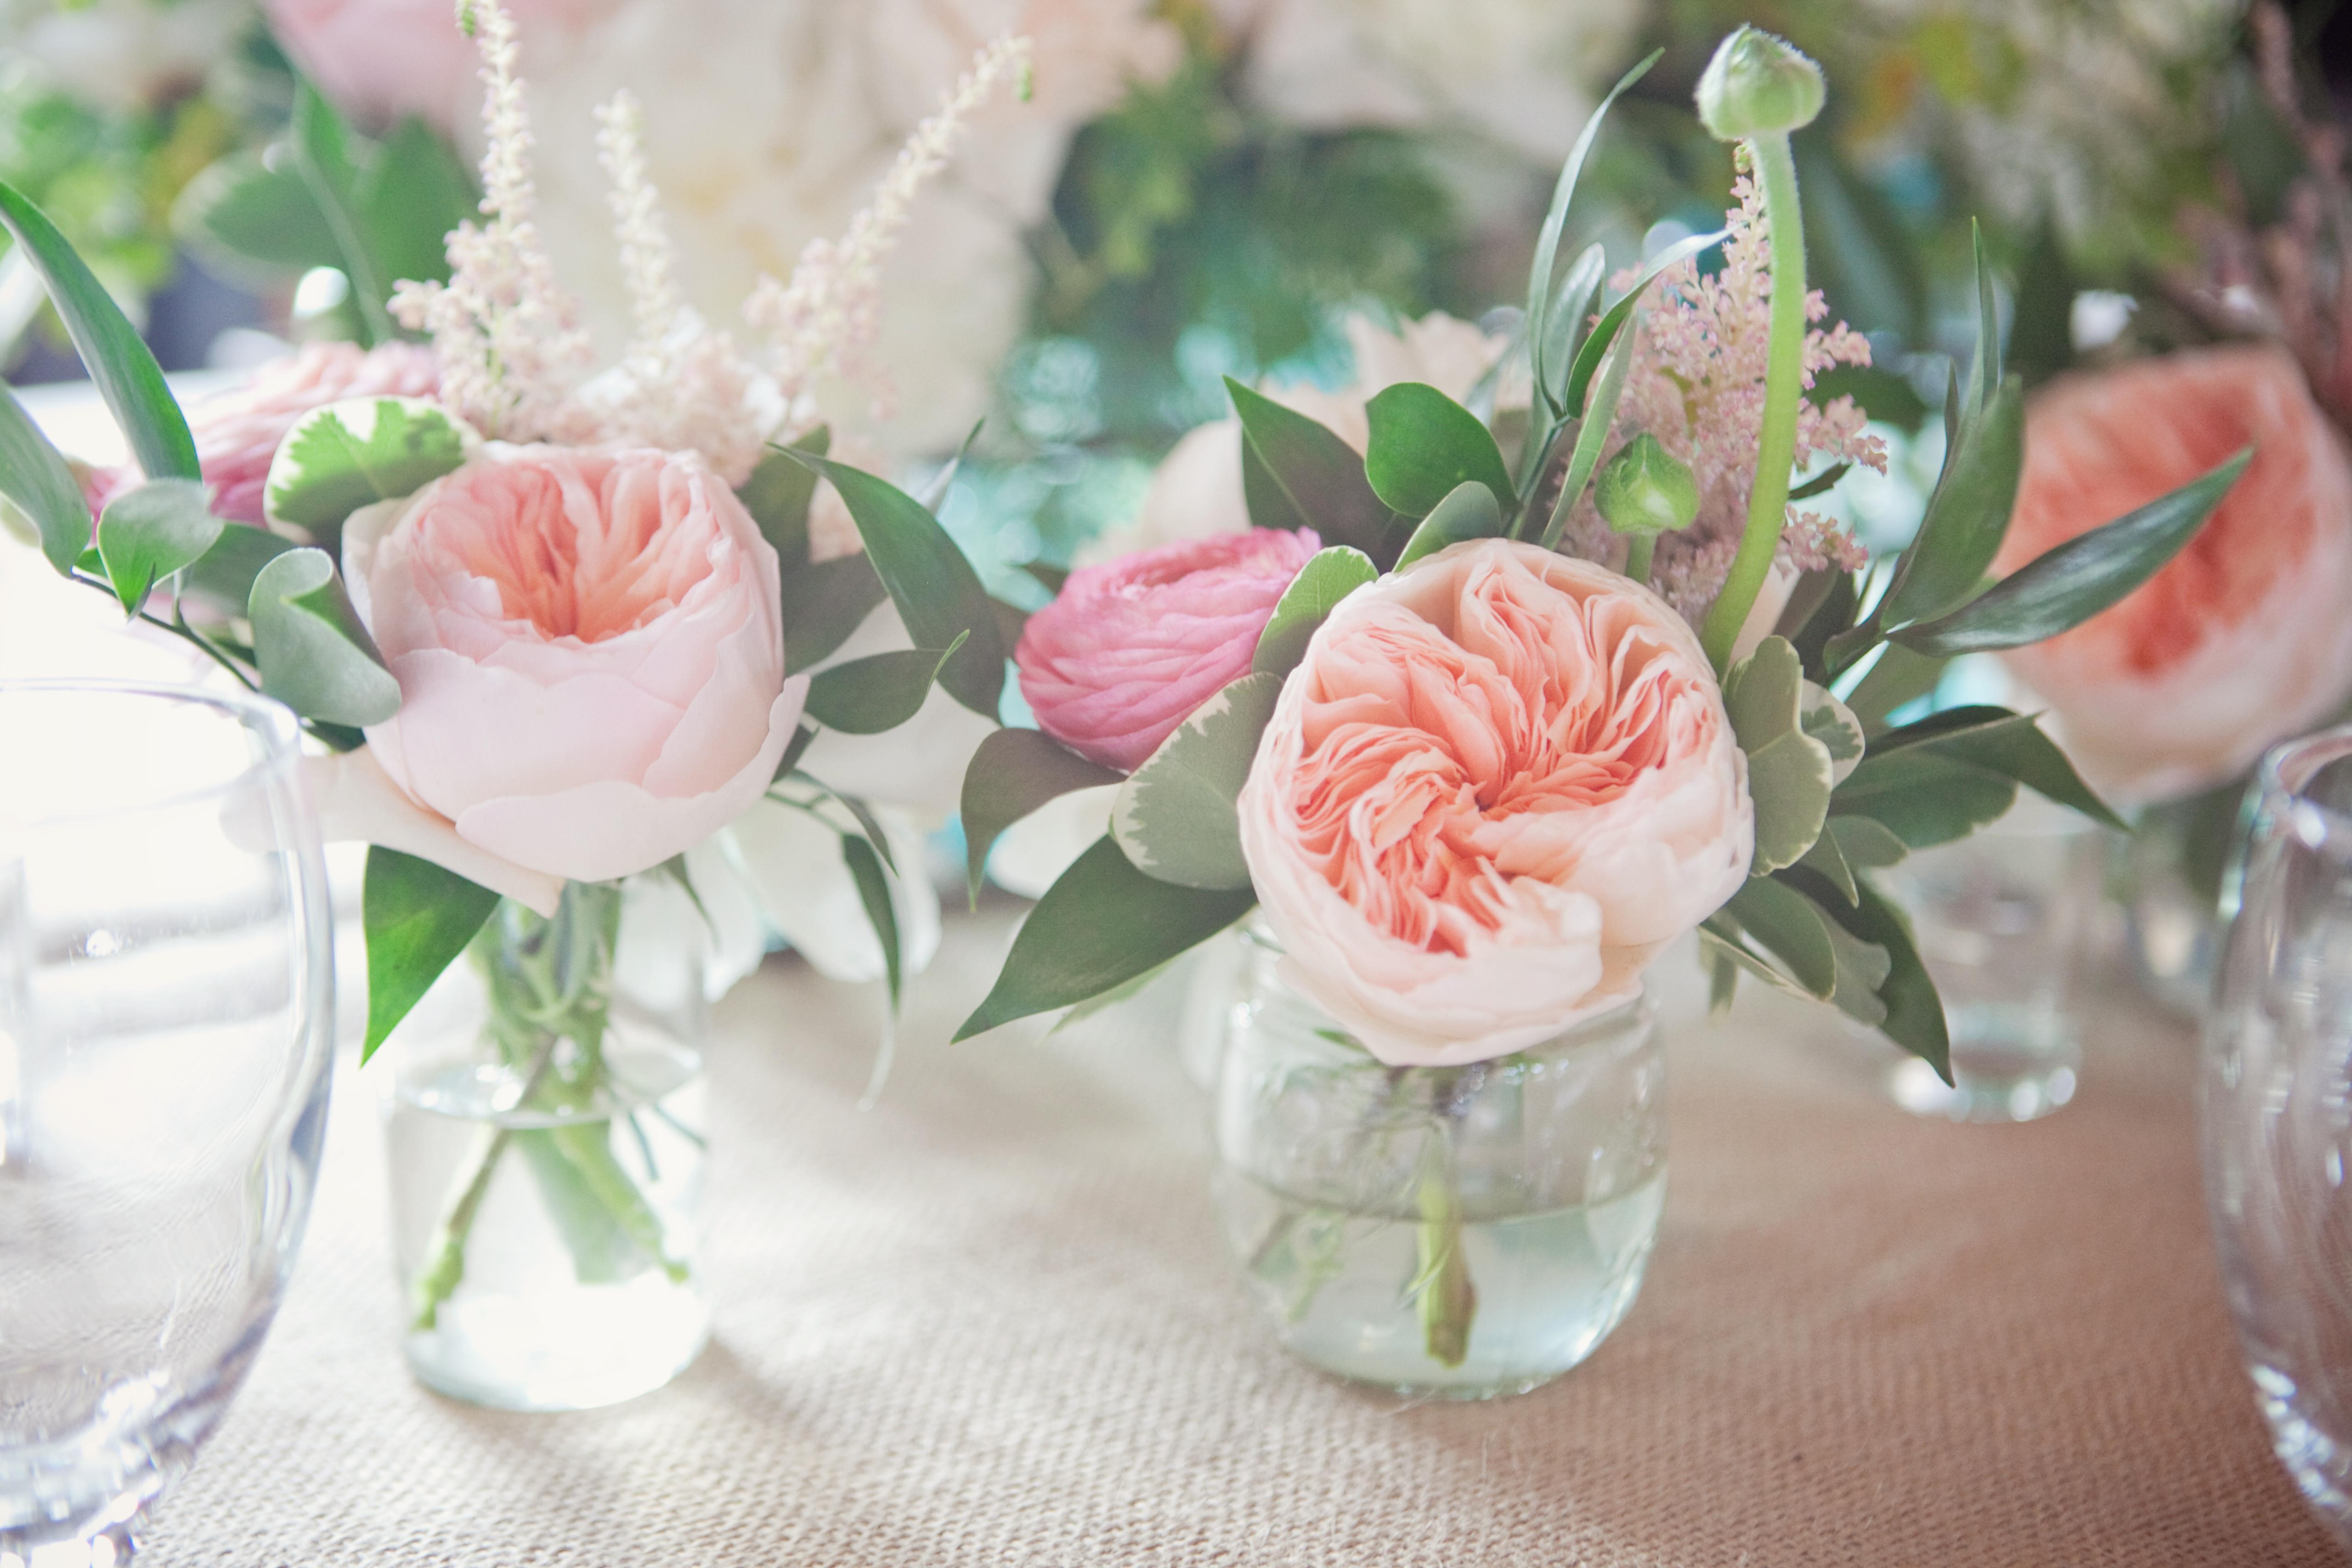 Mini bud vases craftbnb sarah ryan hitched planning floral reviewsmspy